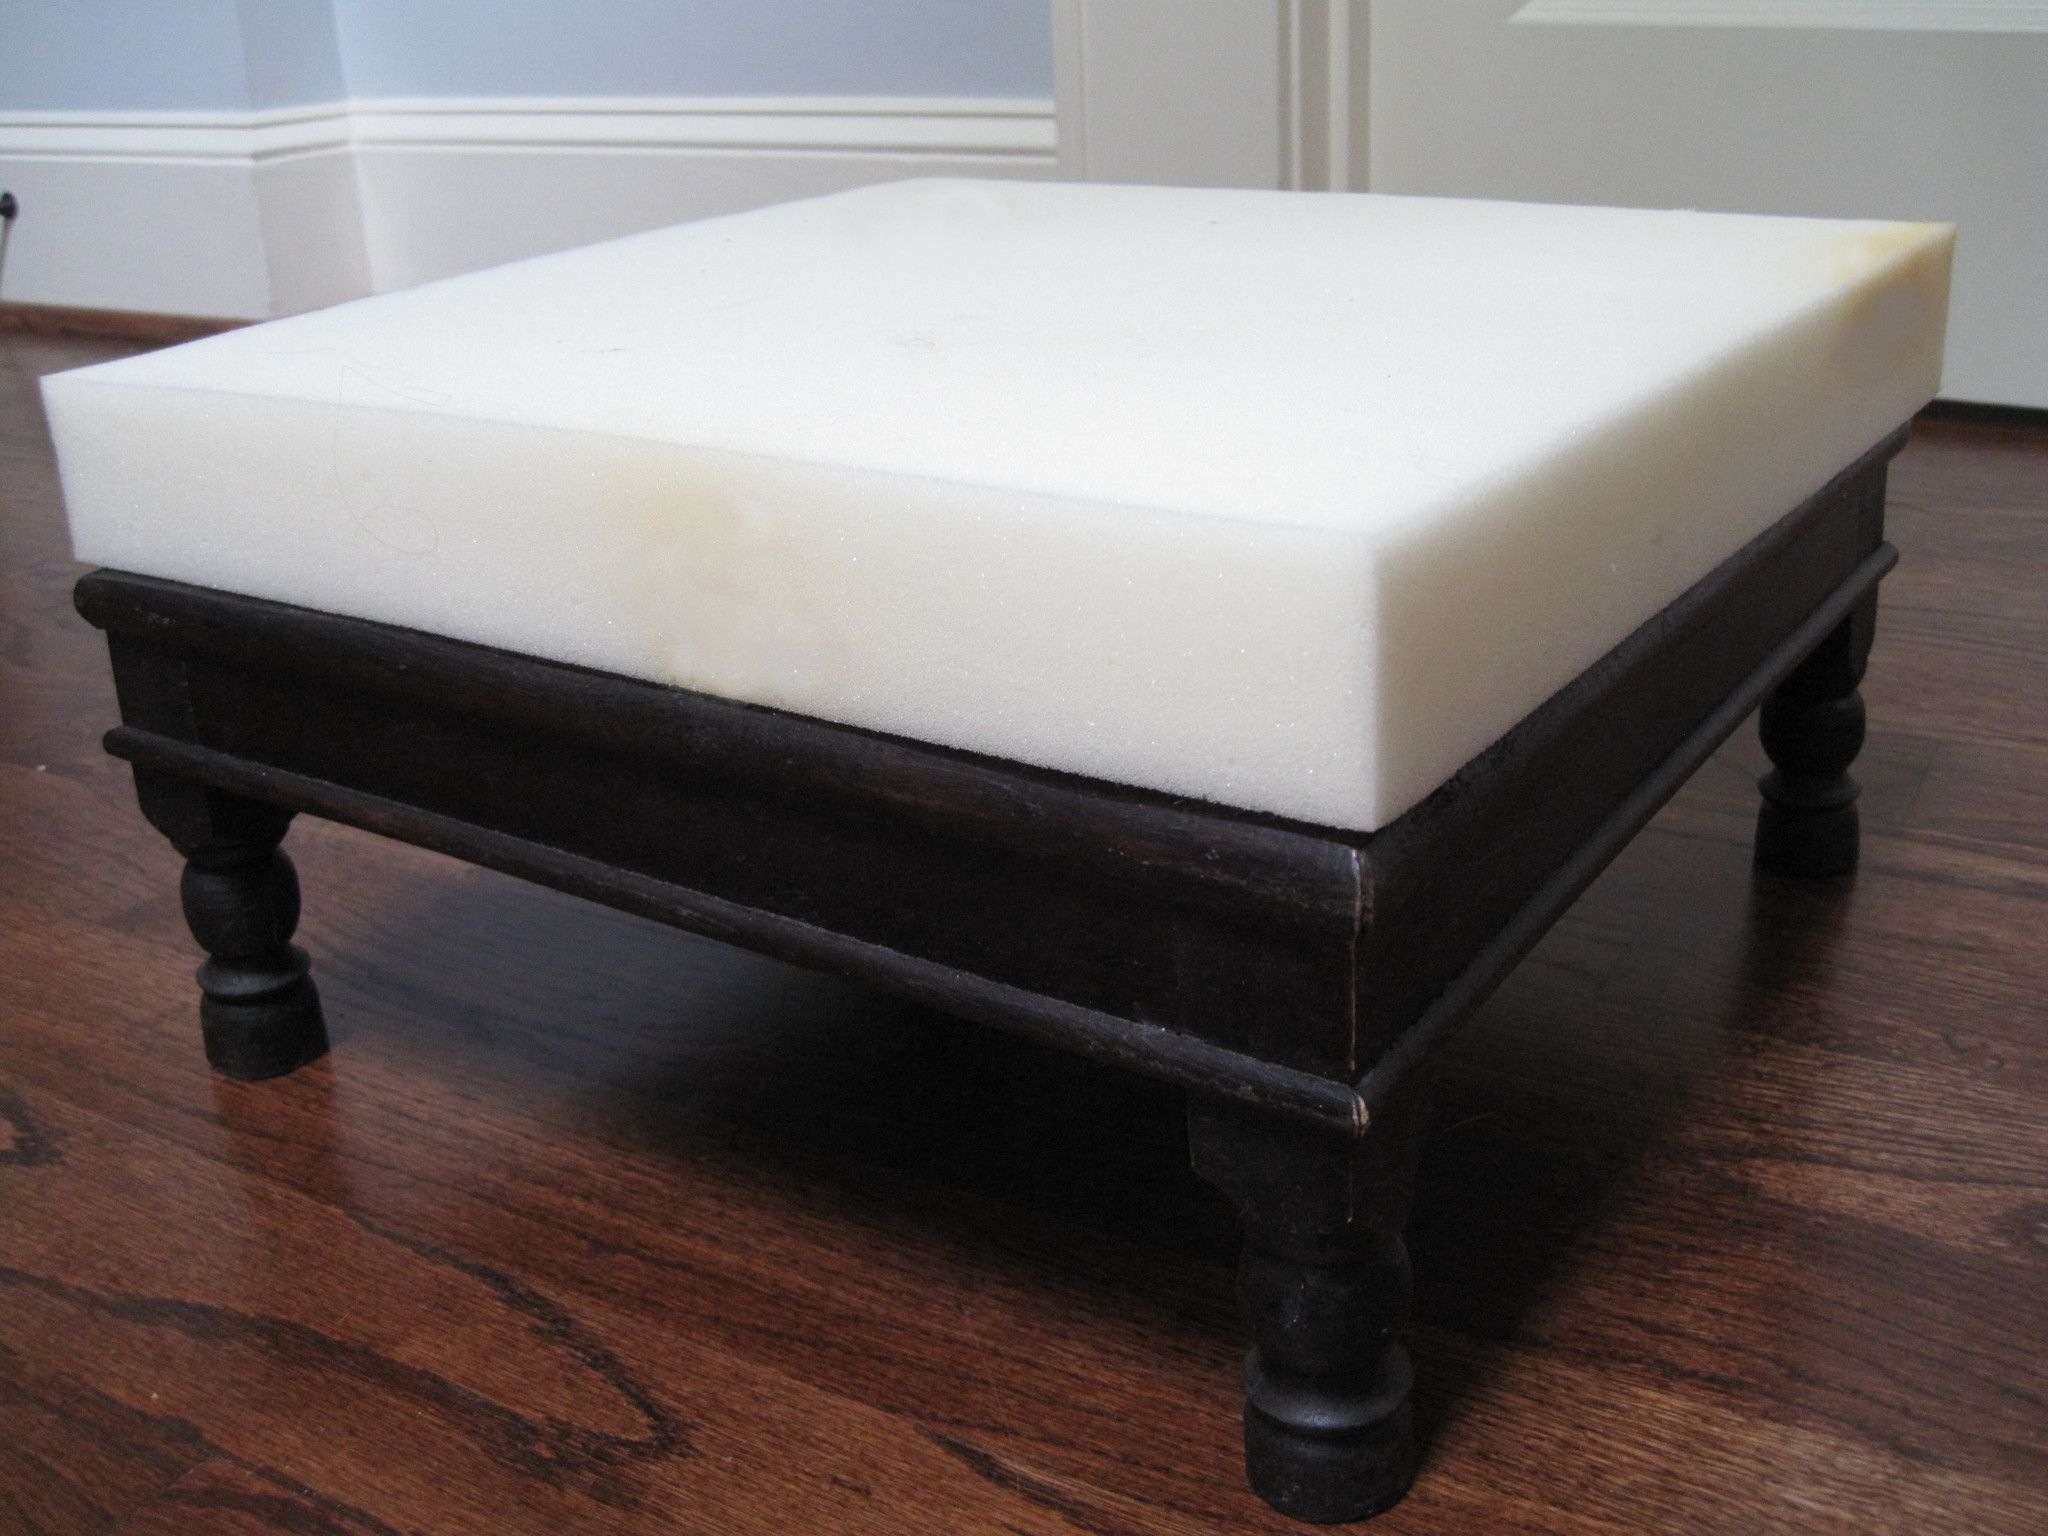 Pleasing Upholstery Foam Professional 4 X 46 X 46 Foot Stool Theyellowbook Wood Chair Design Ideas Theyellowbookinfo